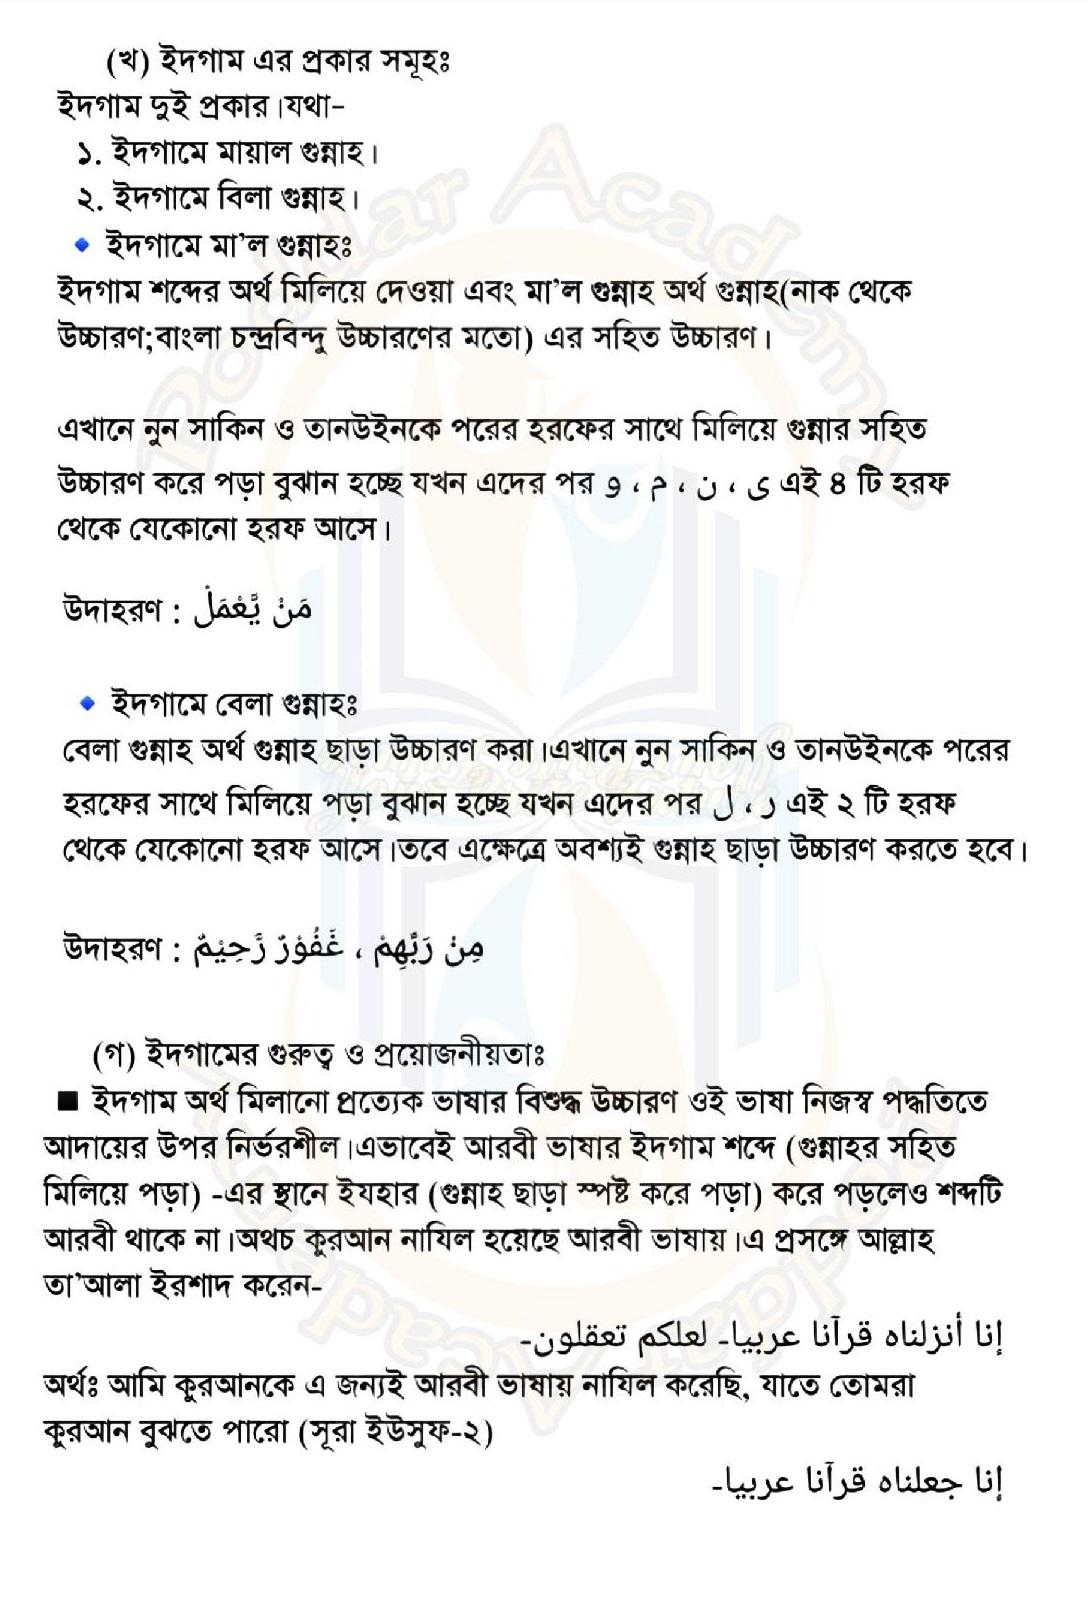 Alim (hsc) পরিক্ষার্থী ২০২১ এর তাজভিদ ১ম পত্র ৭ম সপ্তাহের অ্যাসাইনমেন্ট উত্তর / সমাধান ২০২১ https://www.banglanewsexpress.com/